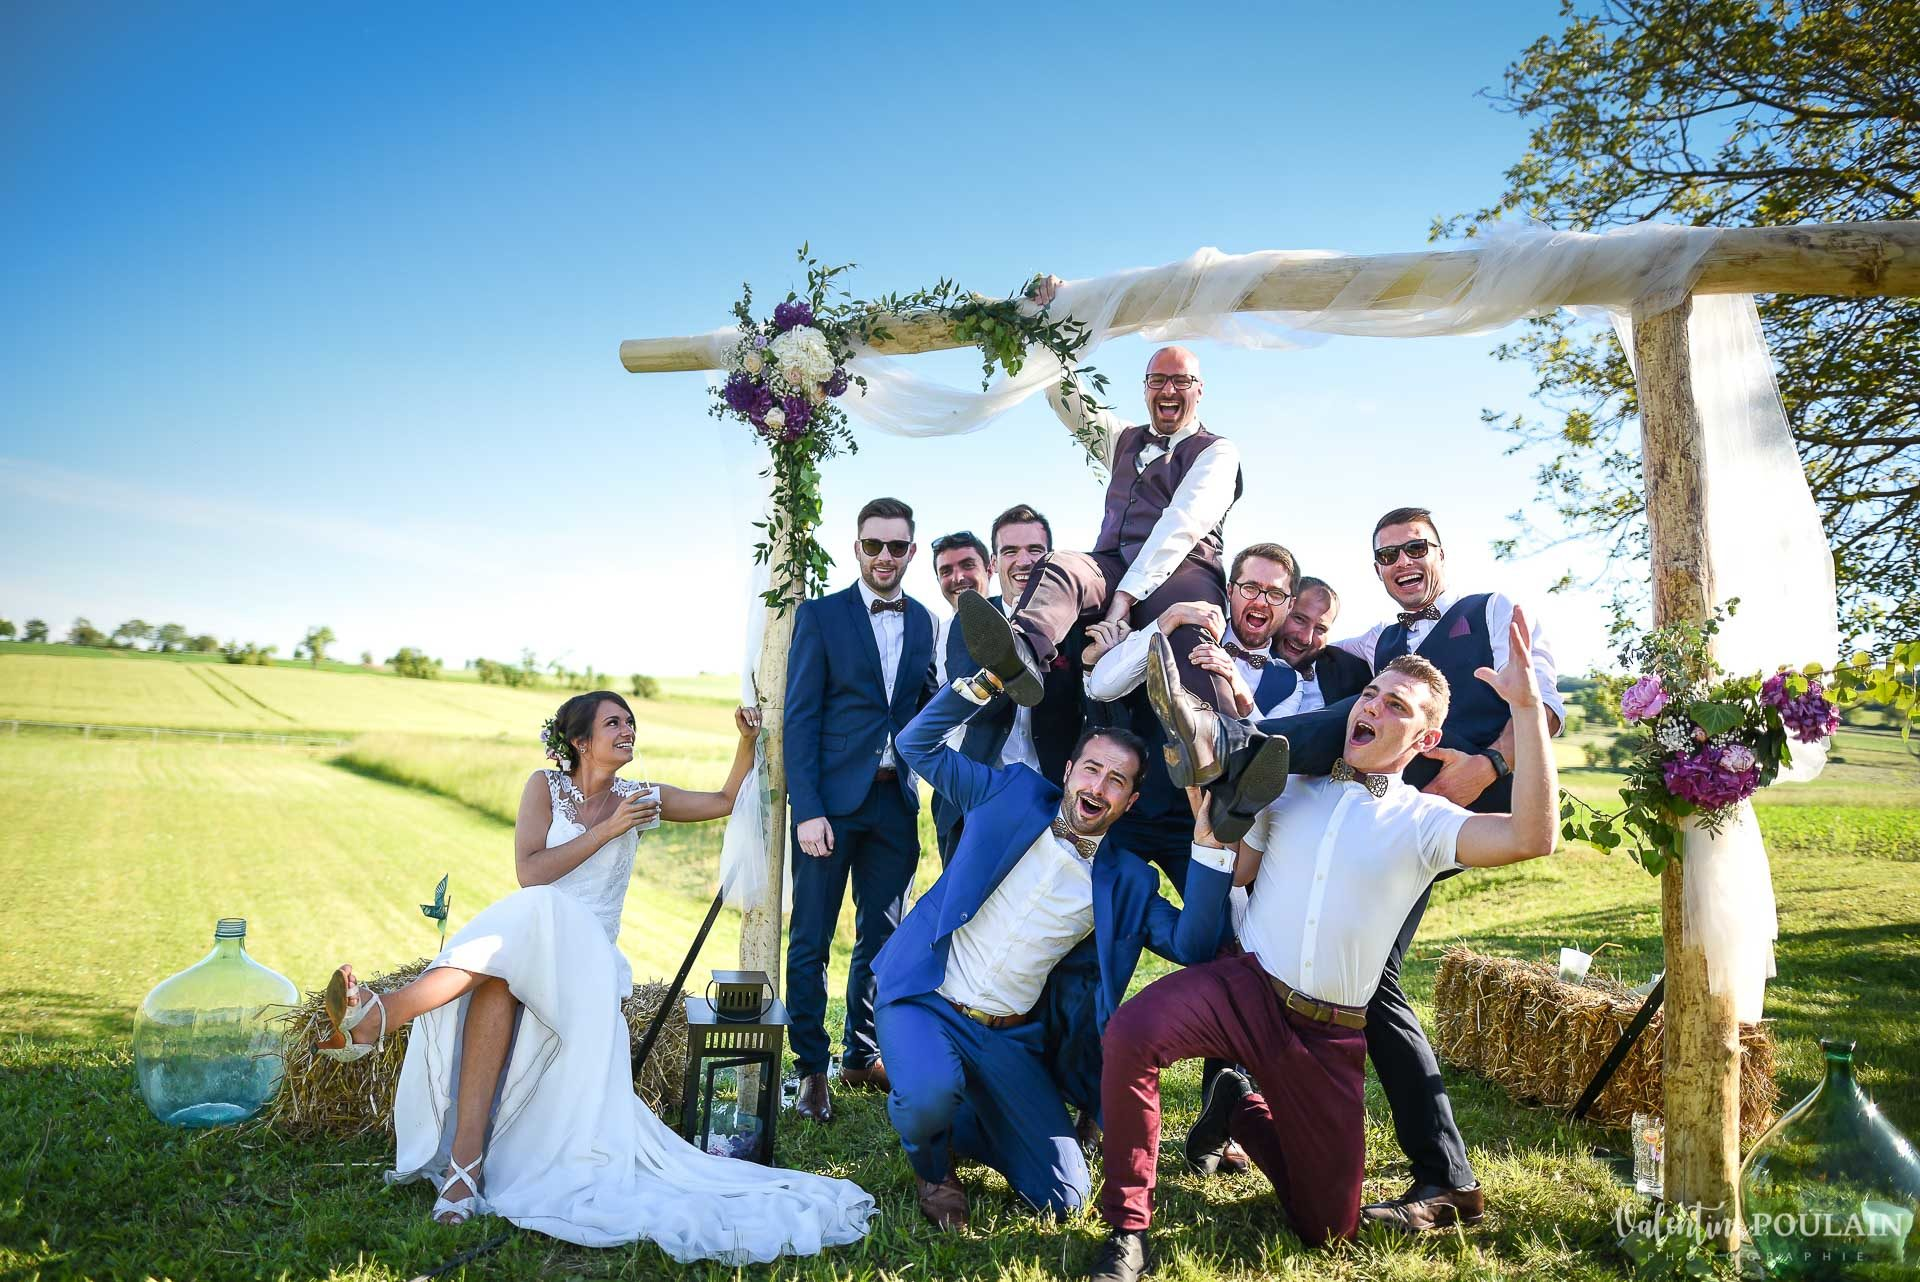 Mariage convivial Saverne - Valentine Poulain fun